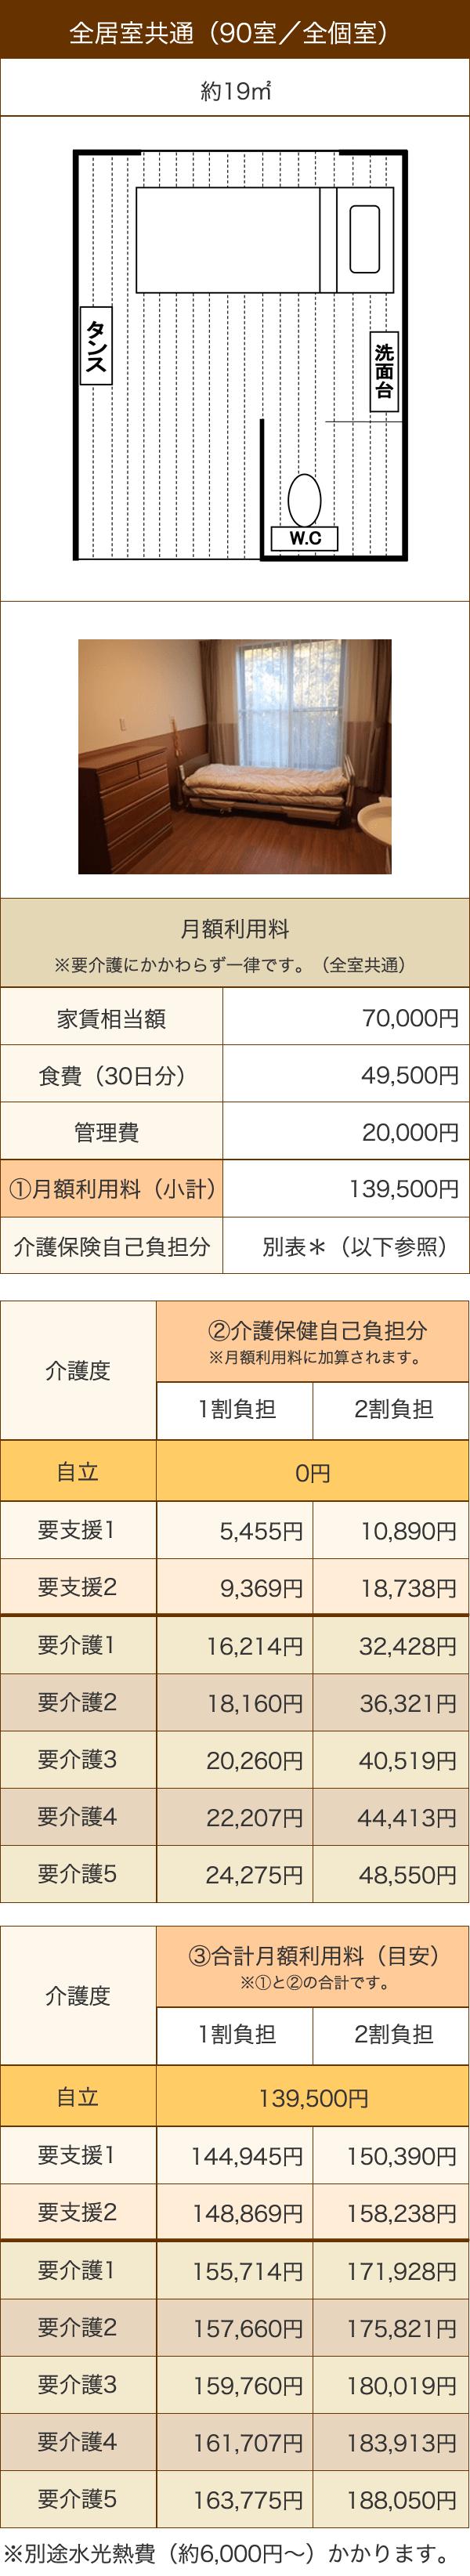 small_19_img-min